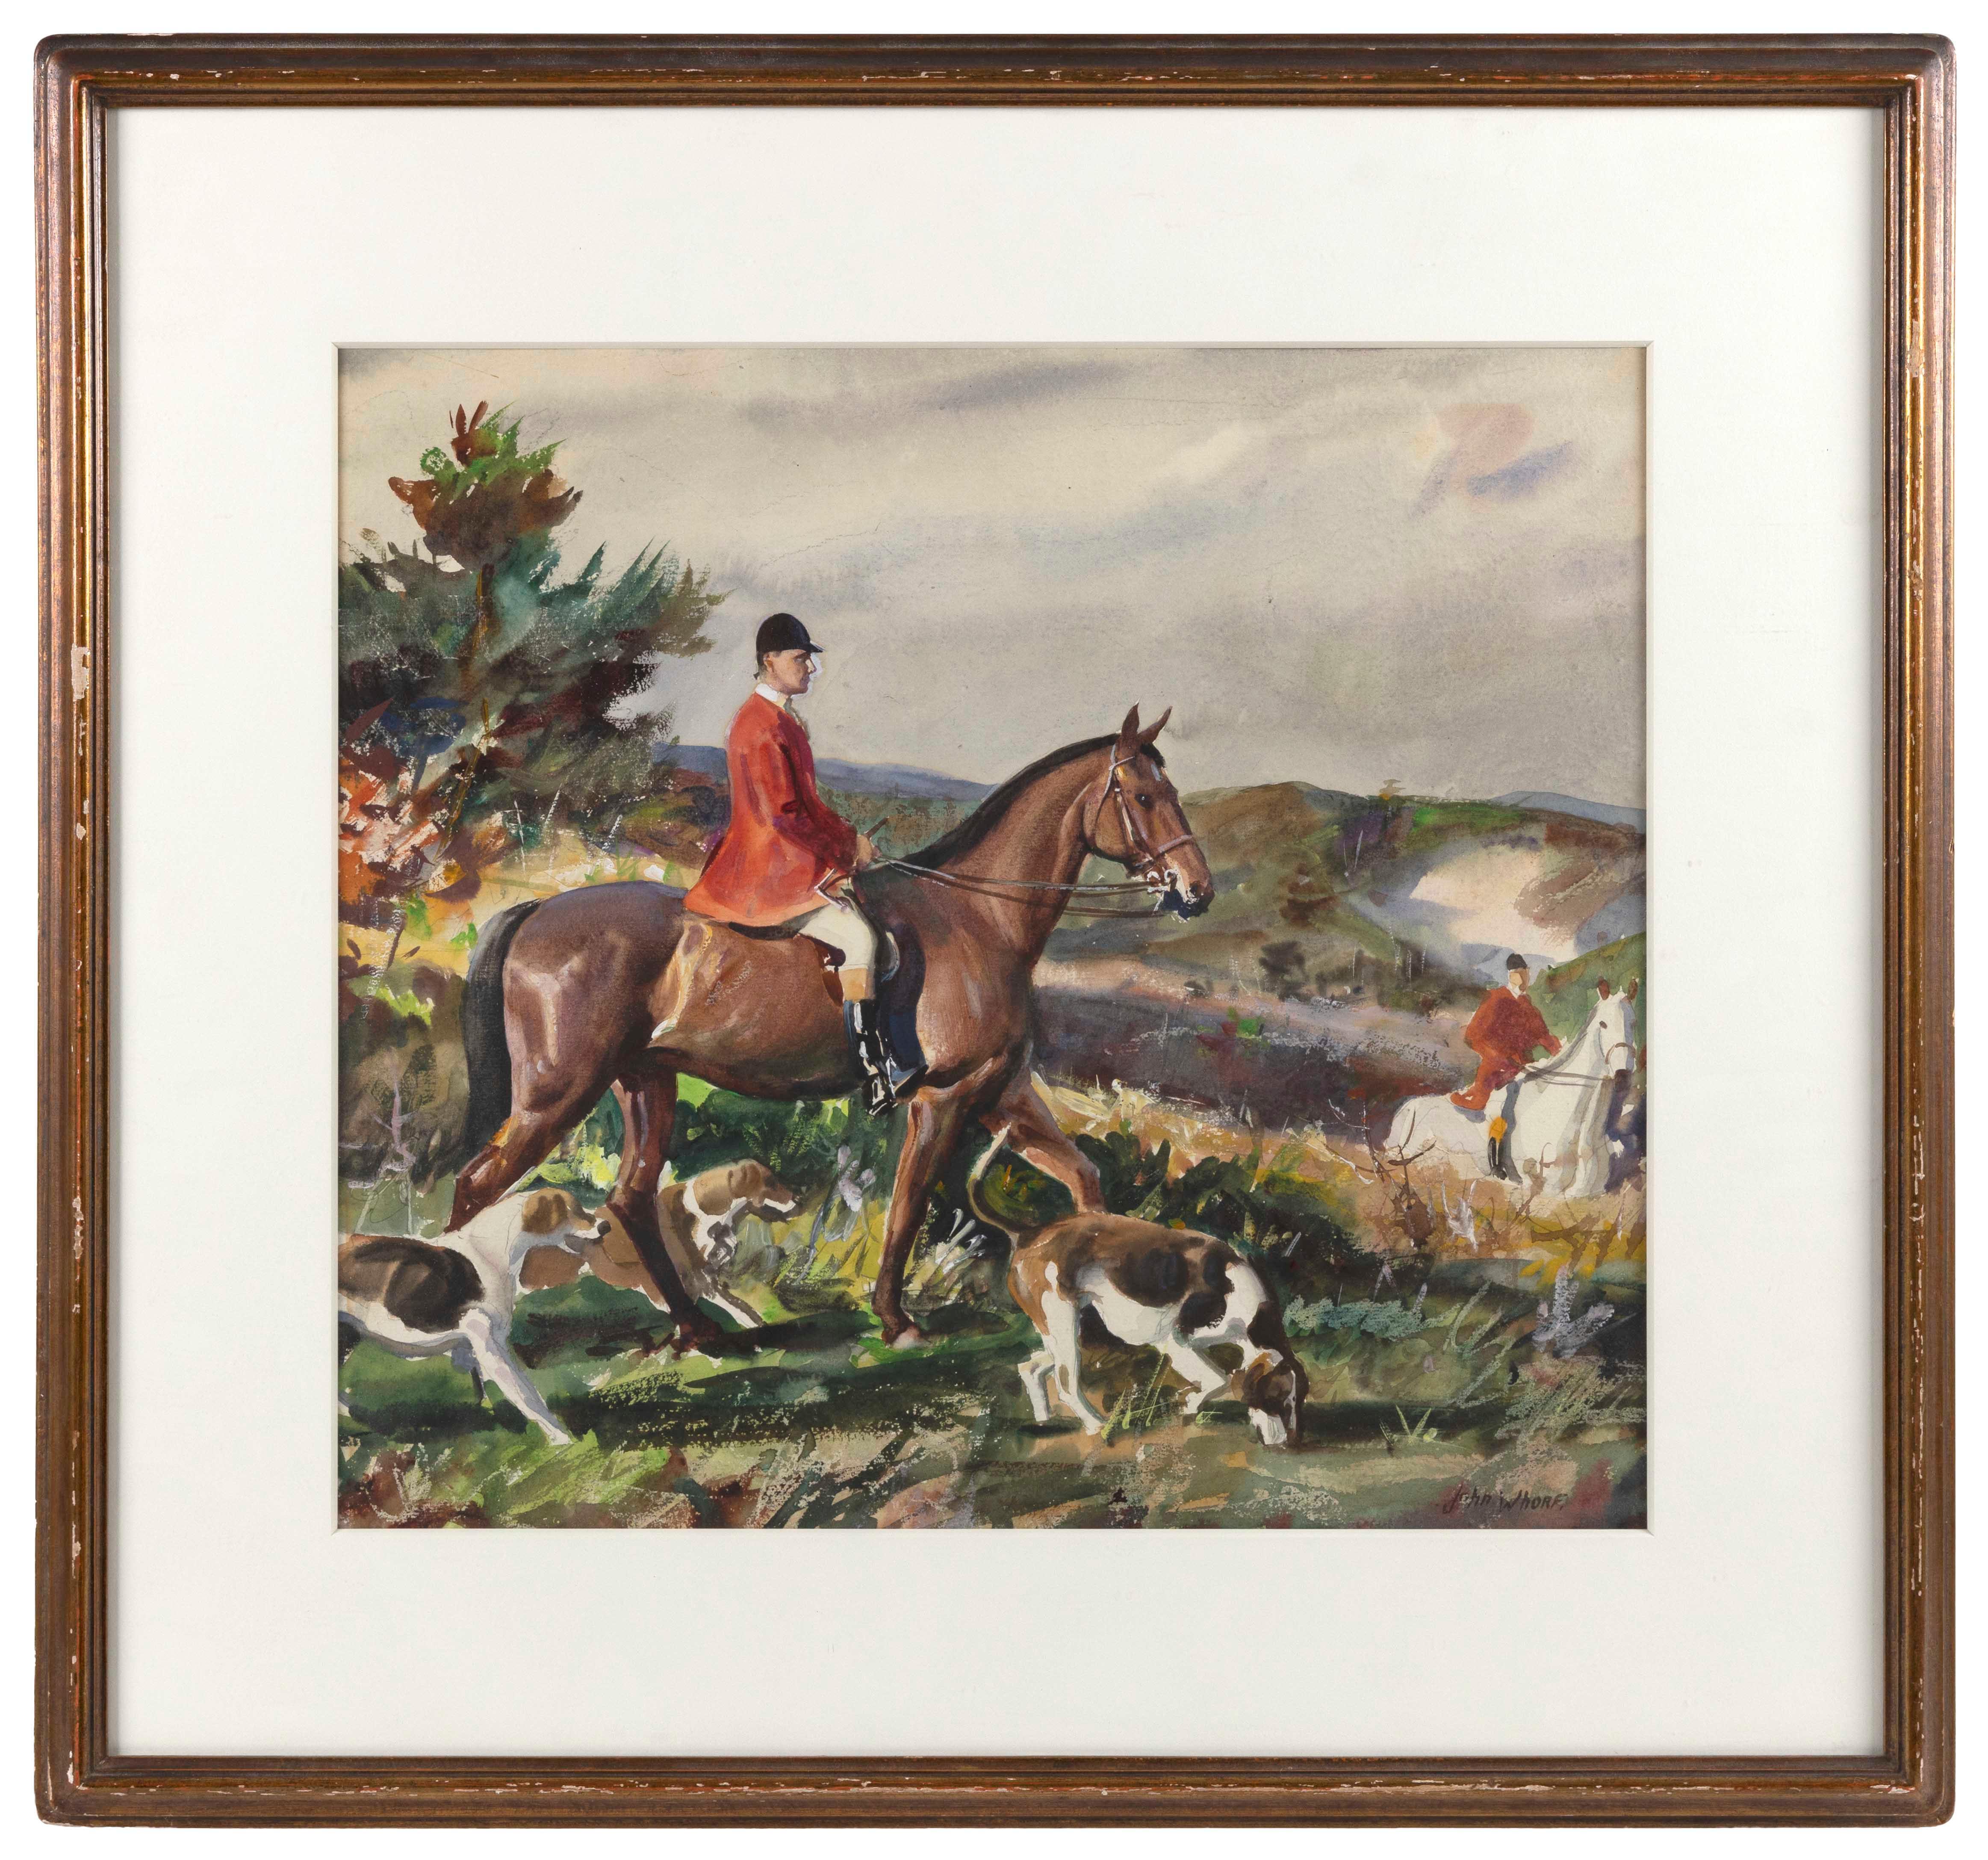 "JOHN WHORF , Massachusetts, 1903-1959, Equestrian scene., Watercolor on paper, 17.5"" x 19"" sight. Framed 26.5"" x 28""."